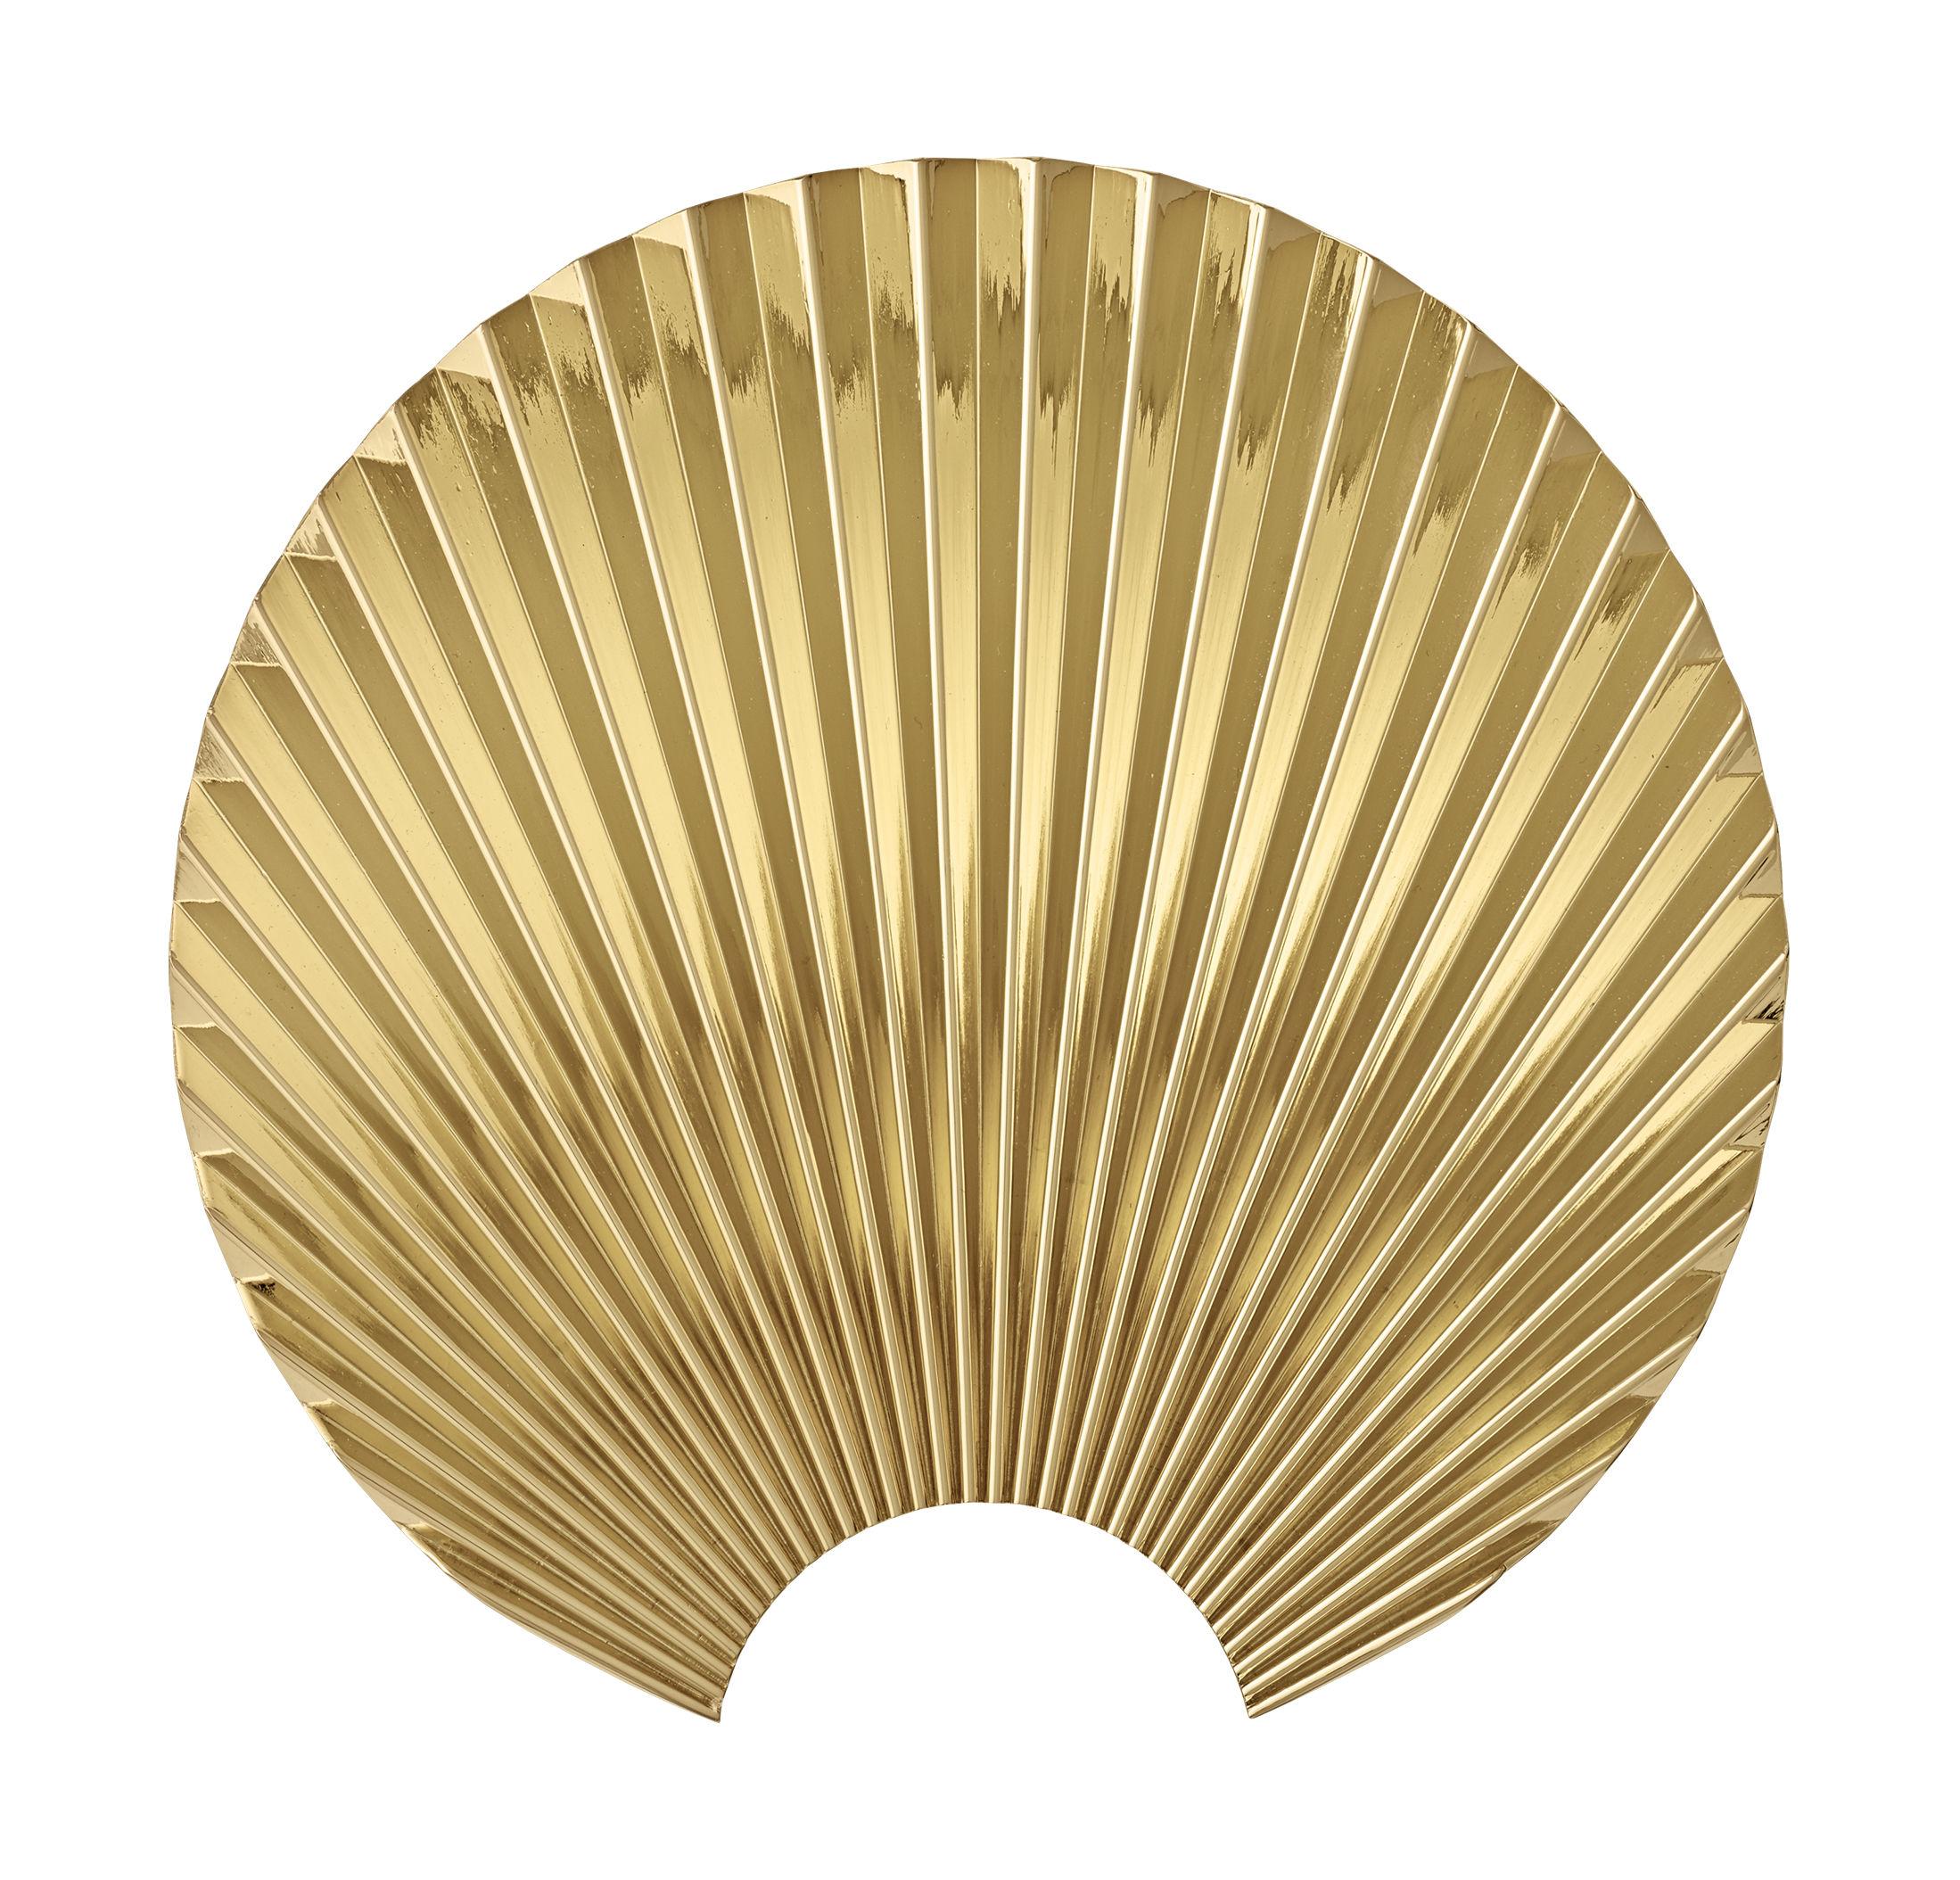 Furniture - Coat Racks & Pegs - Concha Hook - / Zamak - L 5.8 x H 19.5 cm by AYTM - Gold - Zamac